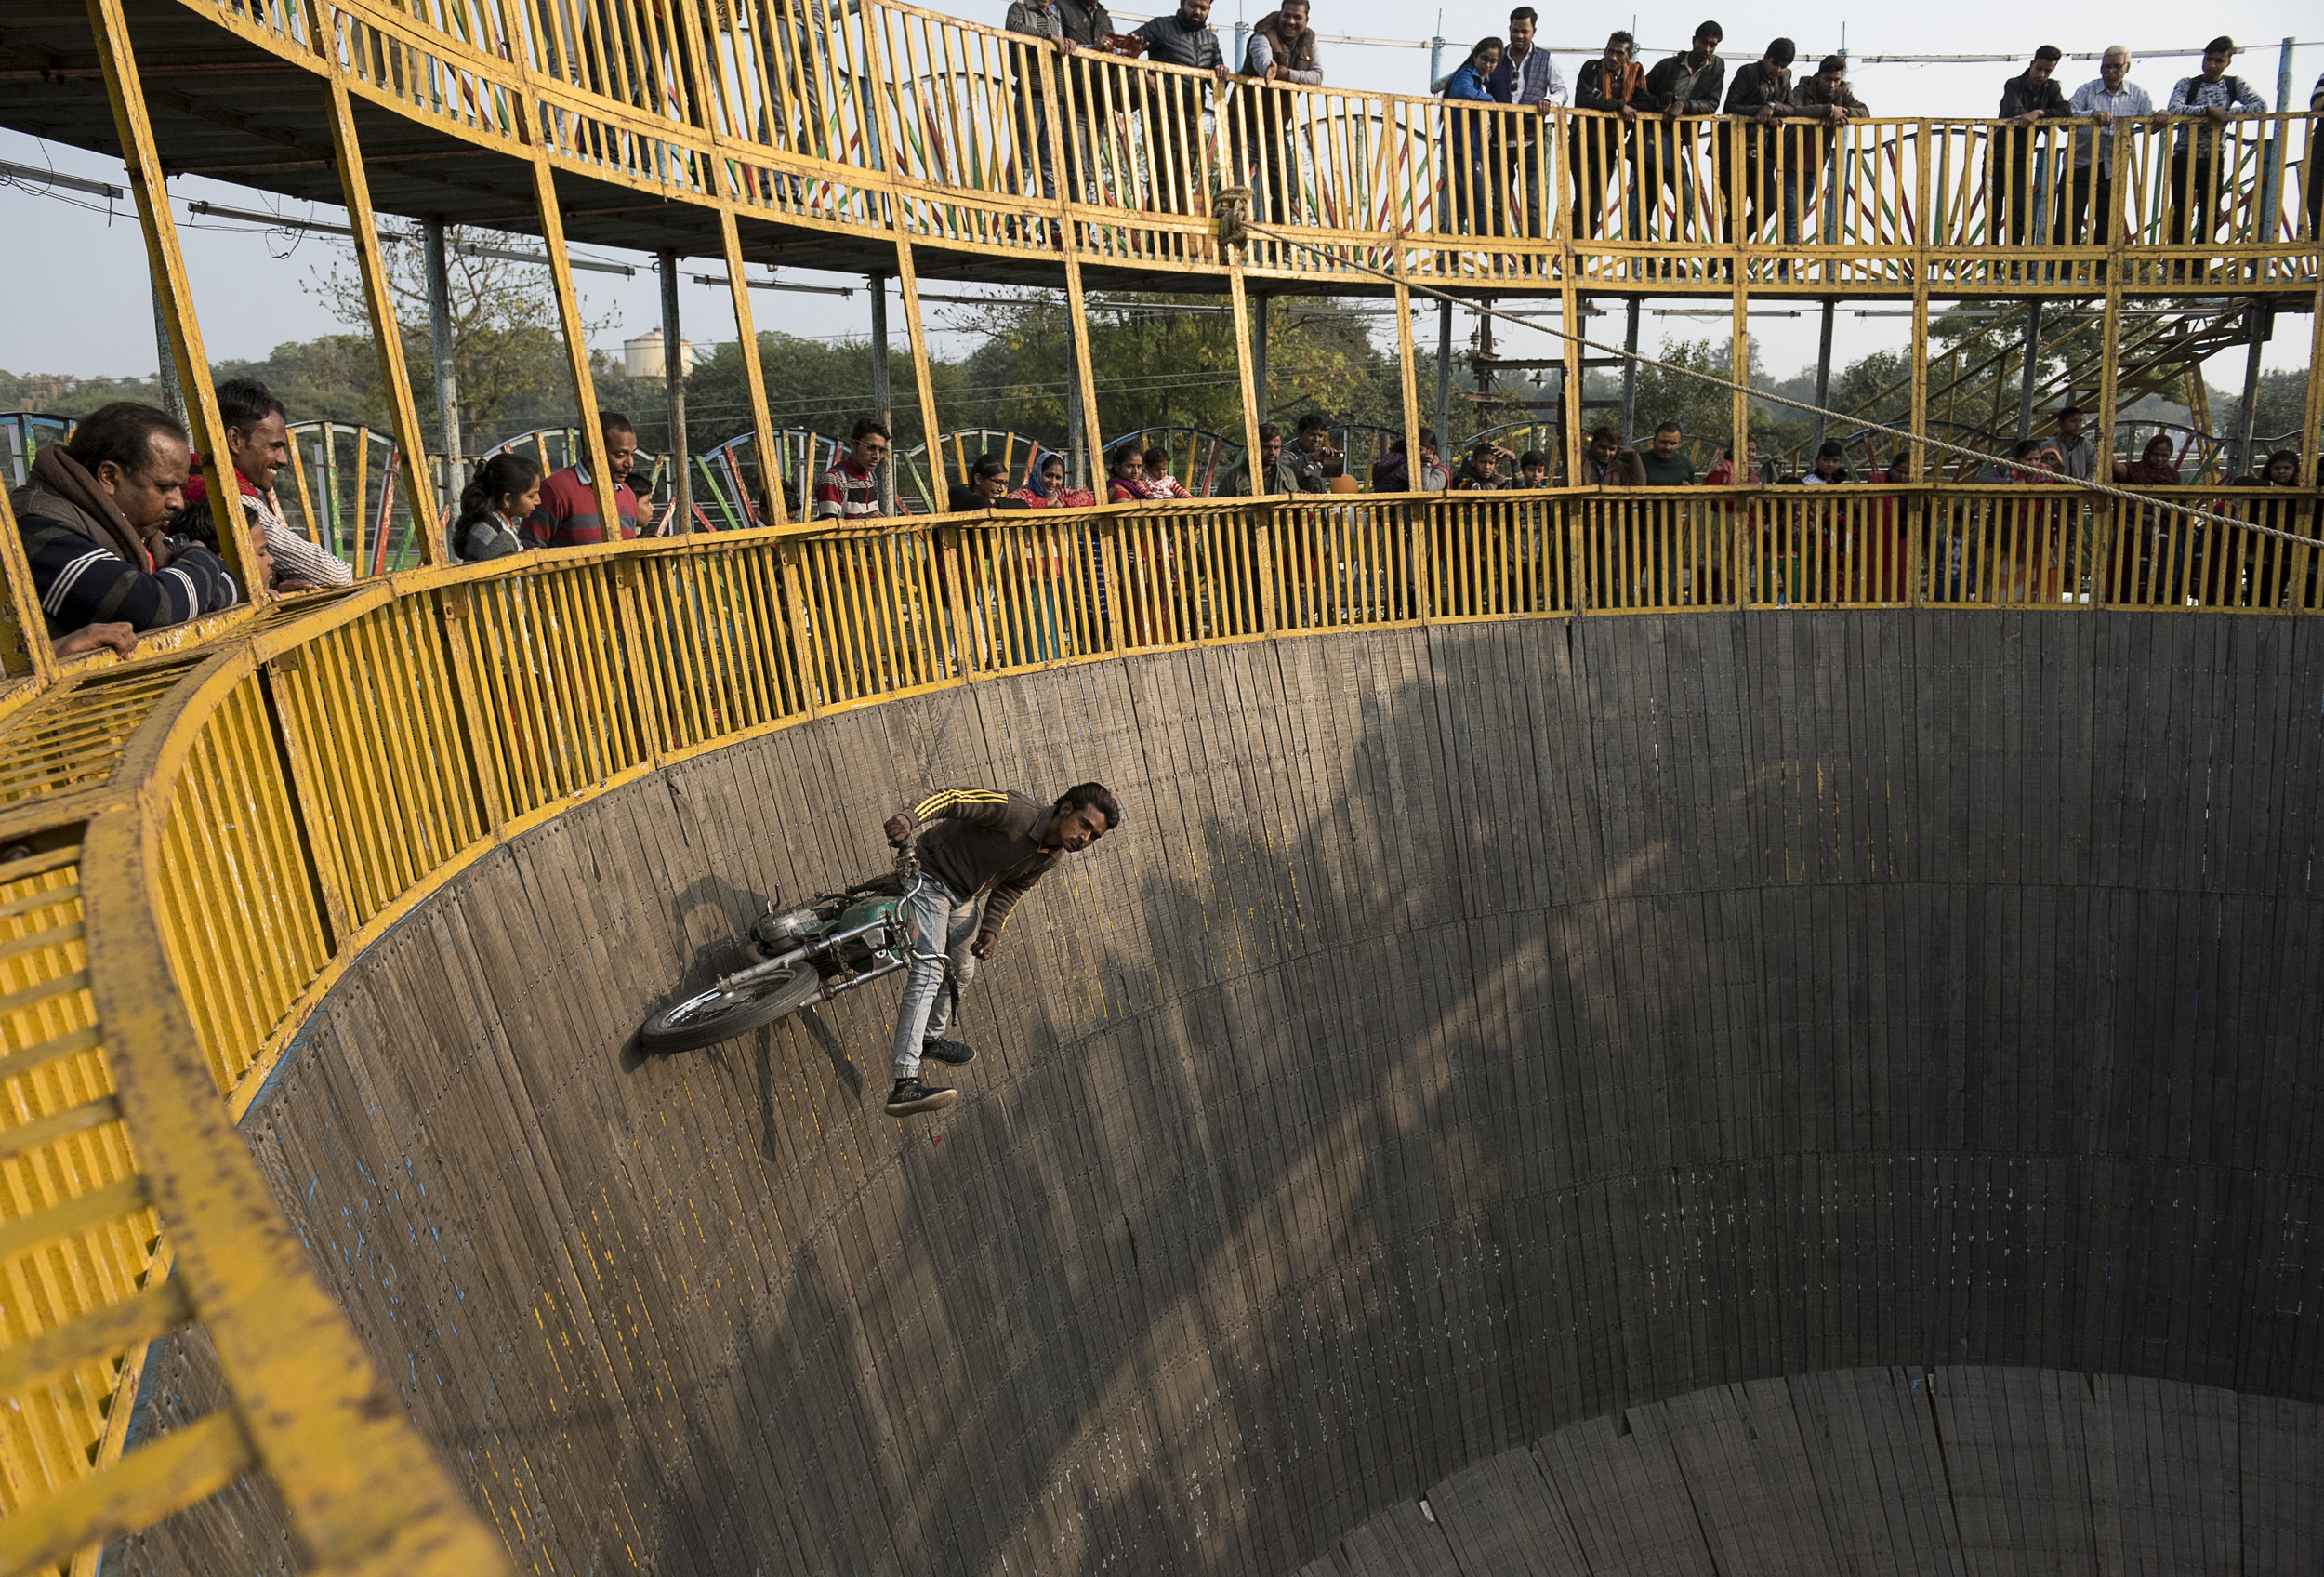 Motordrome, India